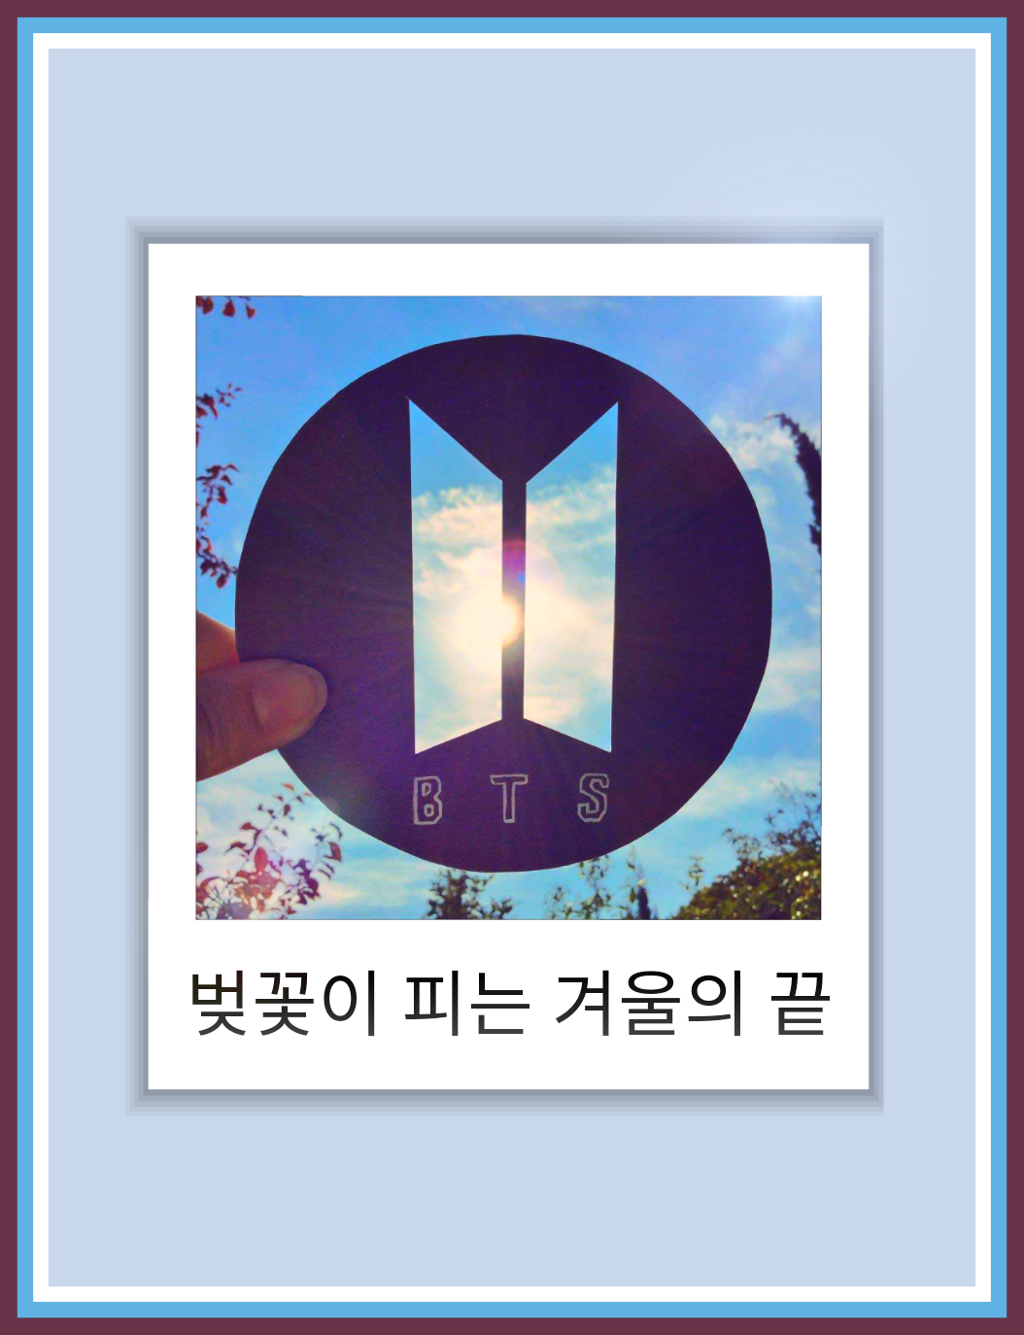 Newlogo Bts Logo Tumblr Wallpaper 벚꽃이 피는 겨울의 끝